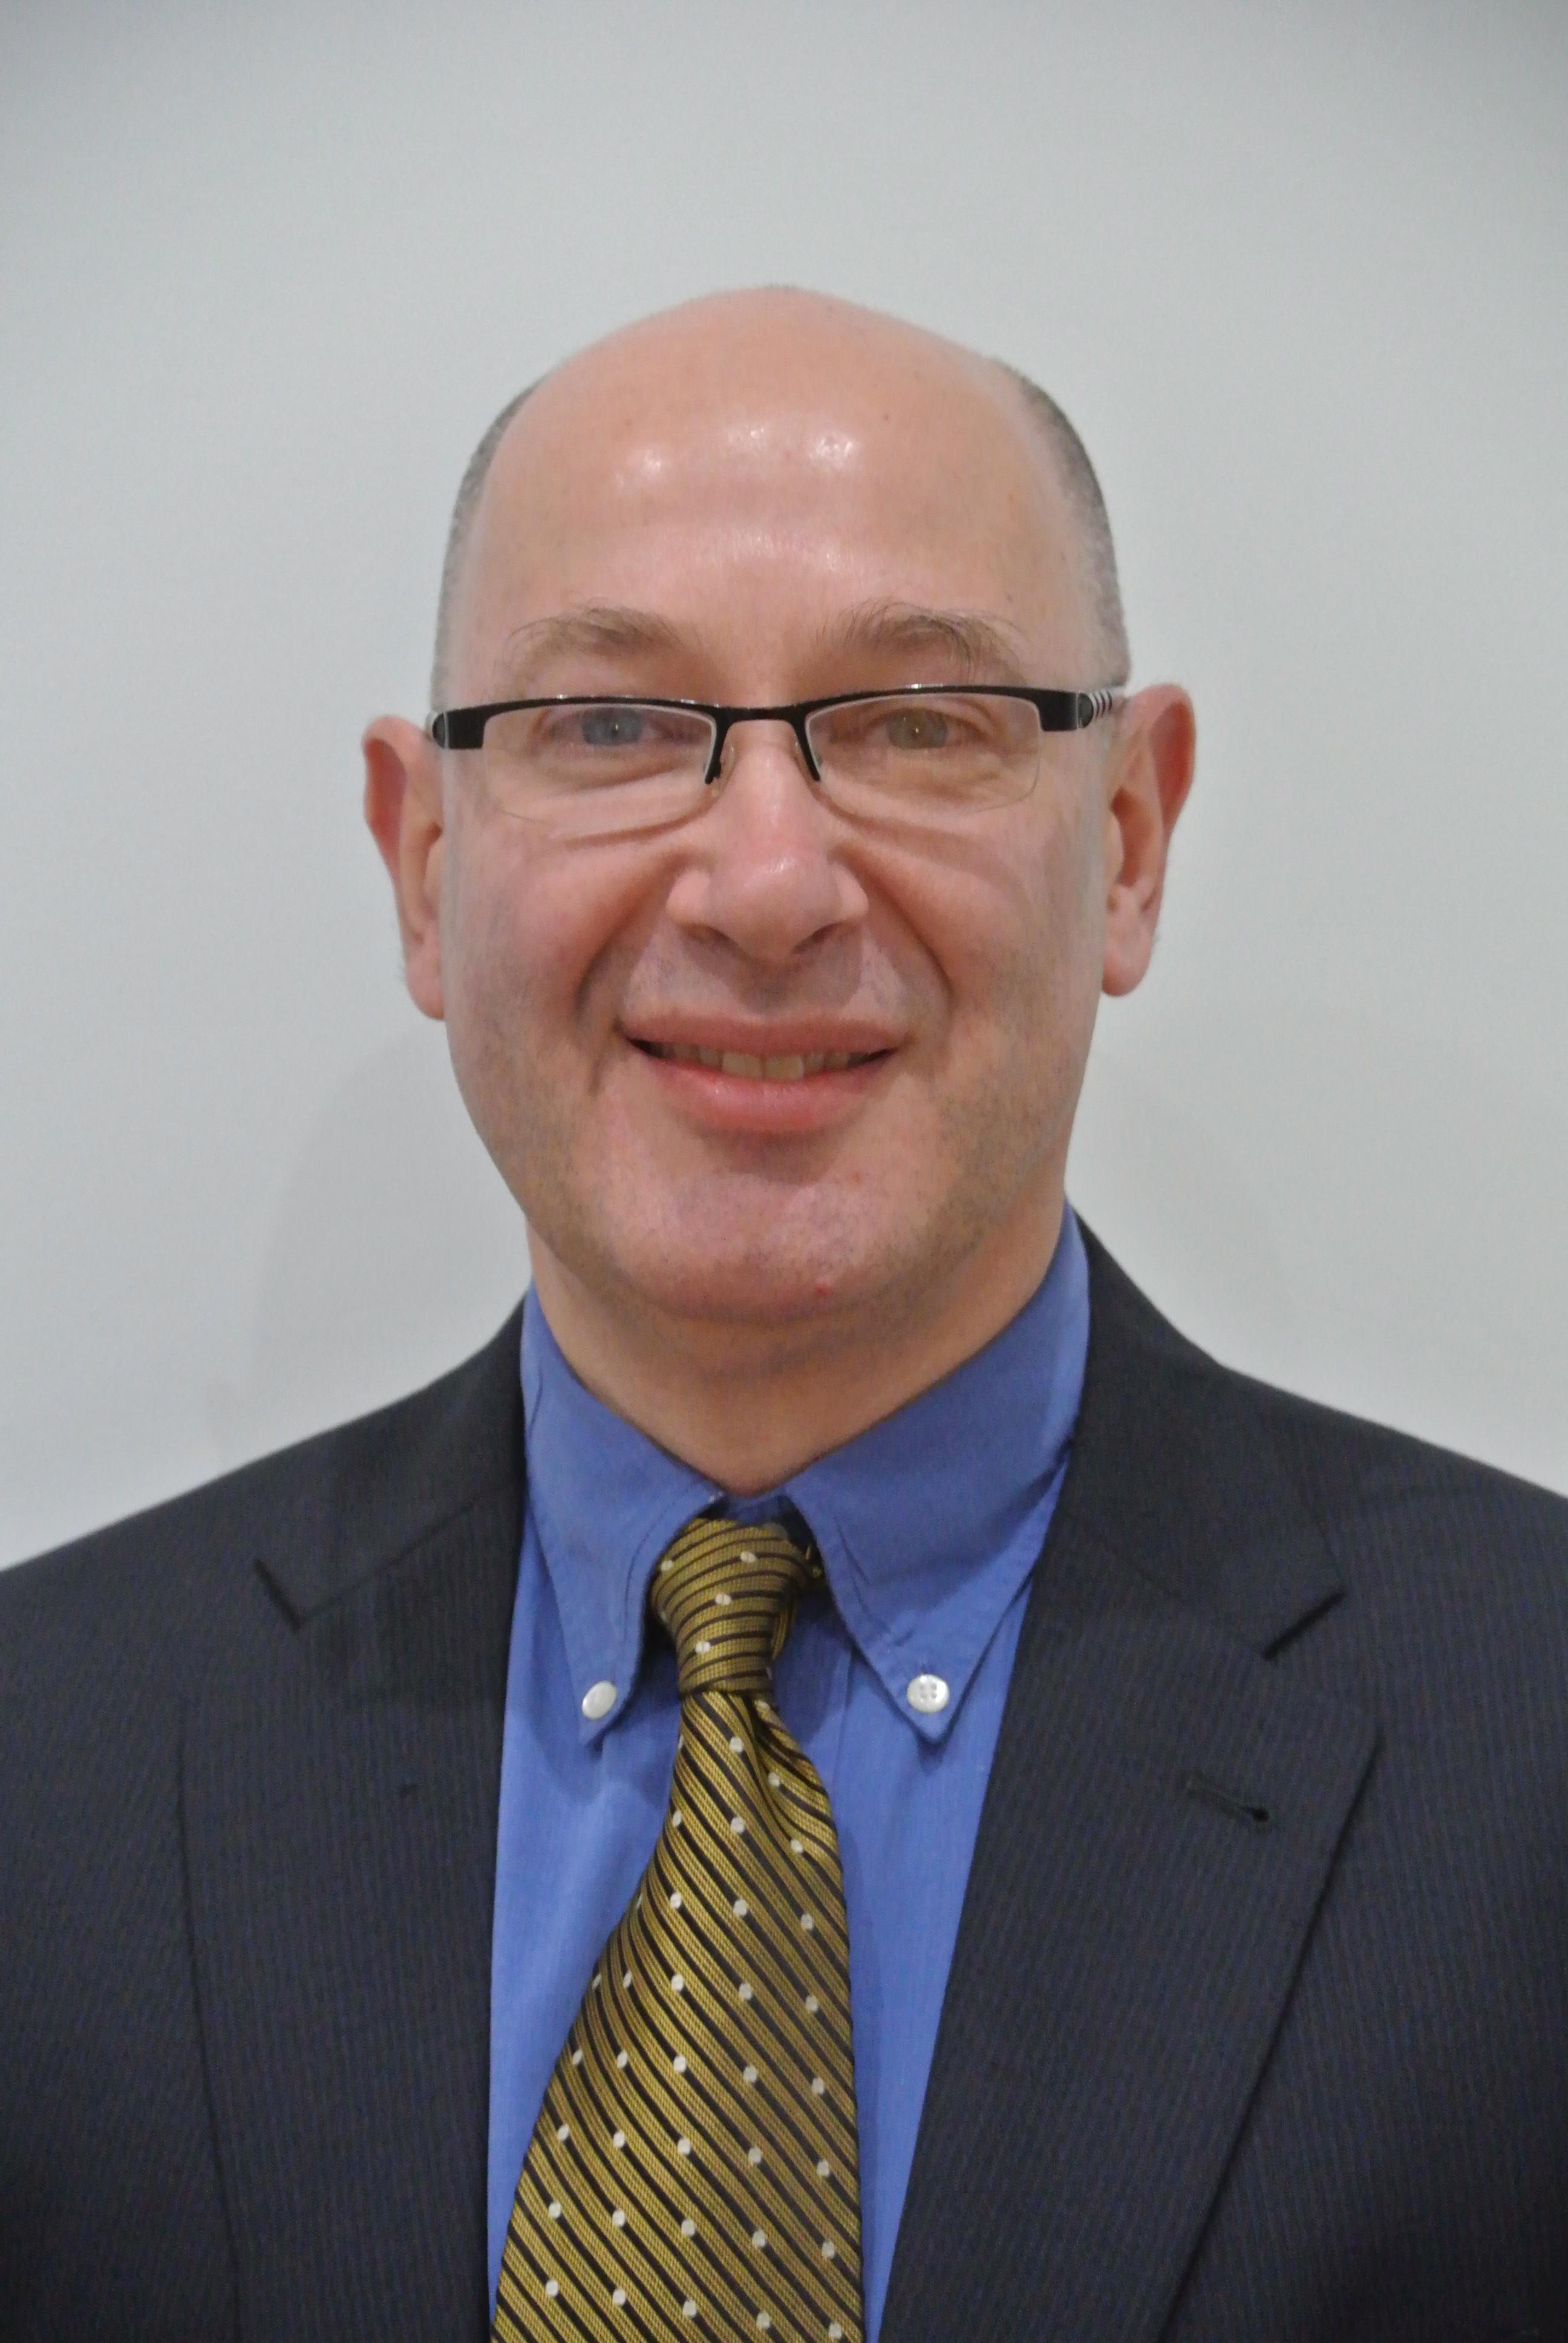 Peter Babic